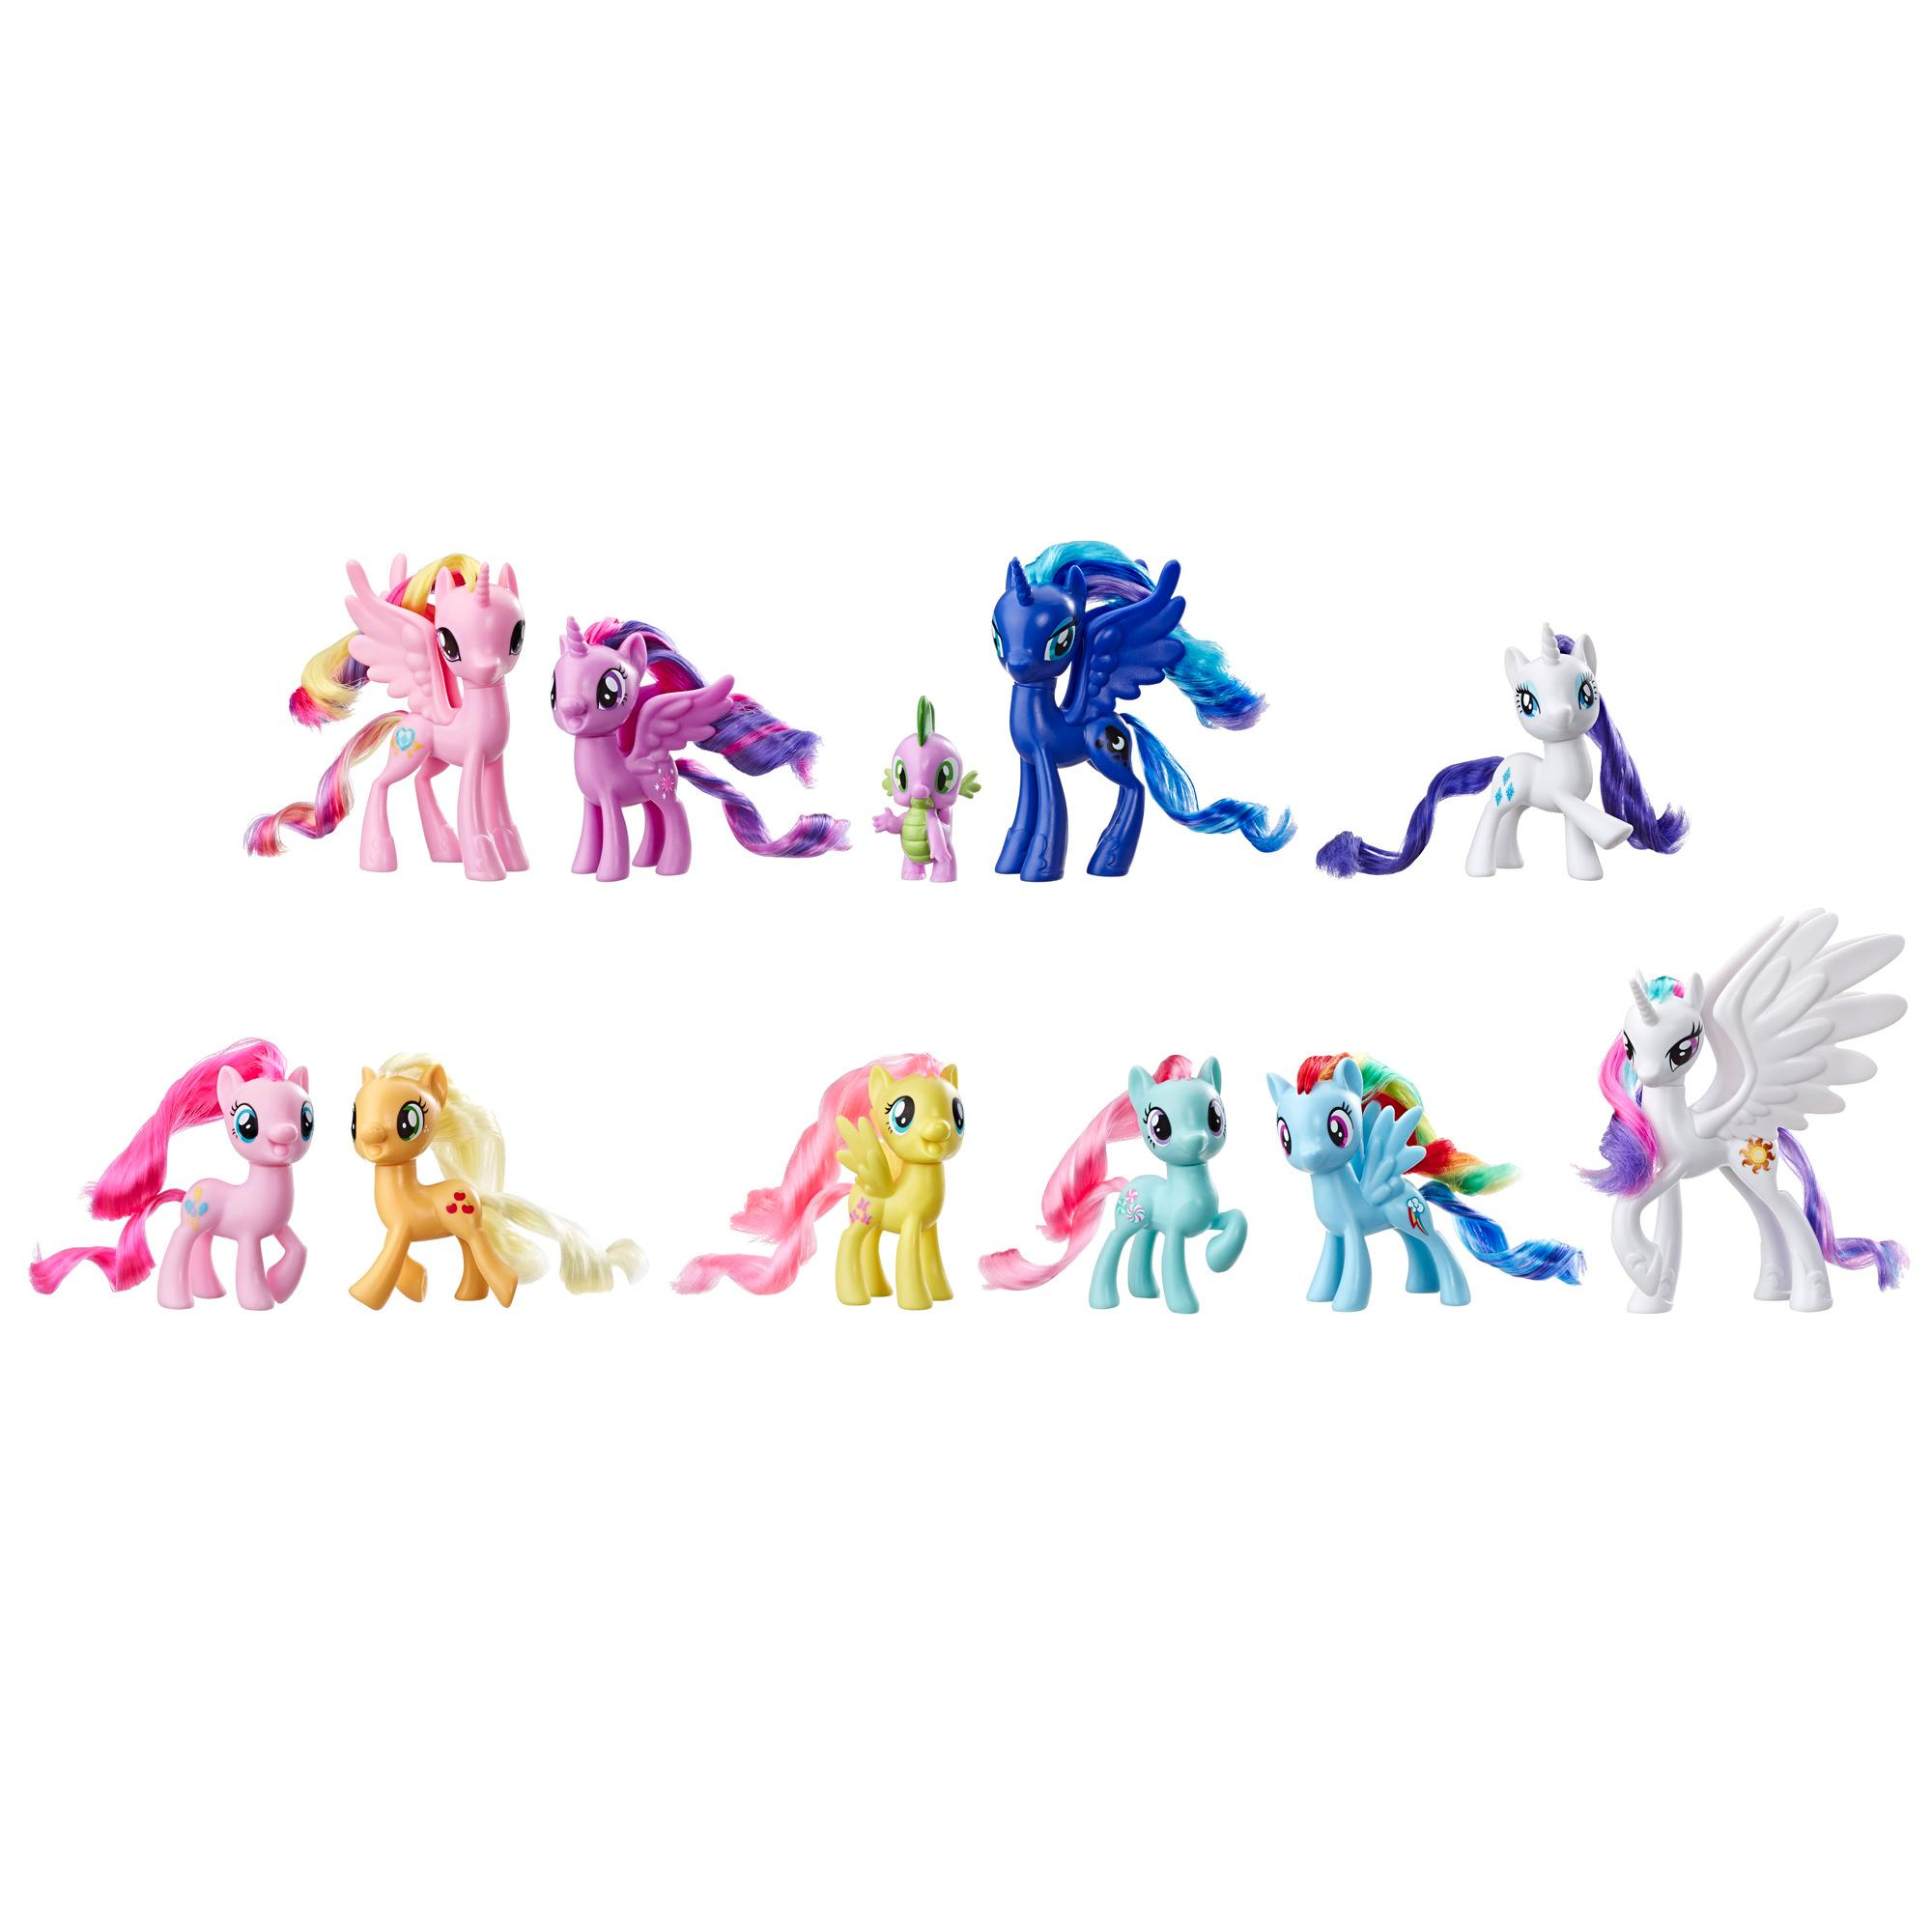 Jouet My Little Pony, Collection de 11 figurines Amis d'Equestria